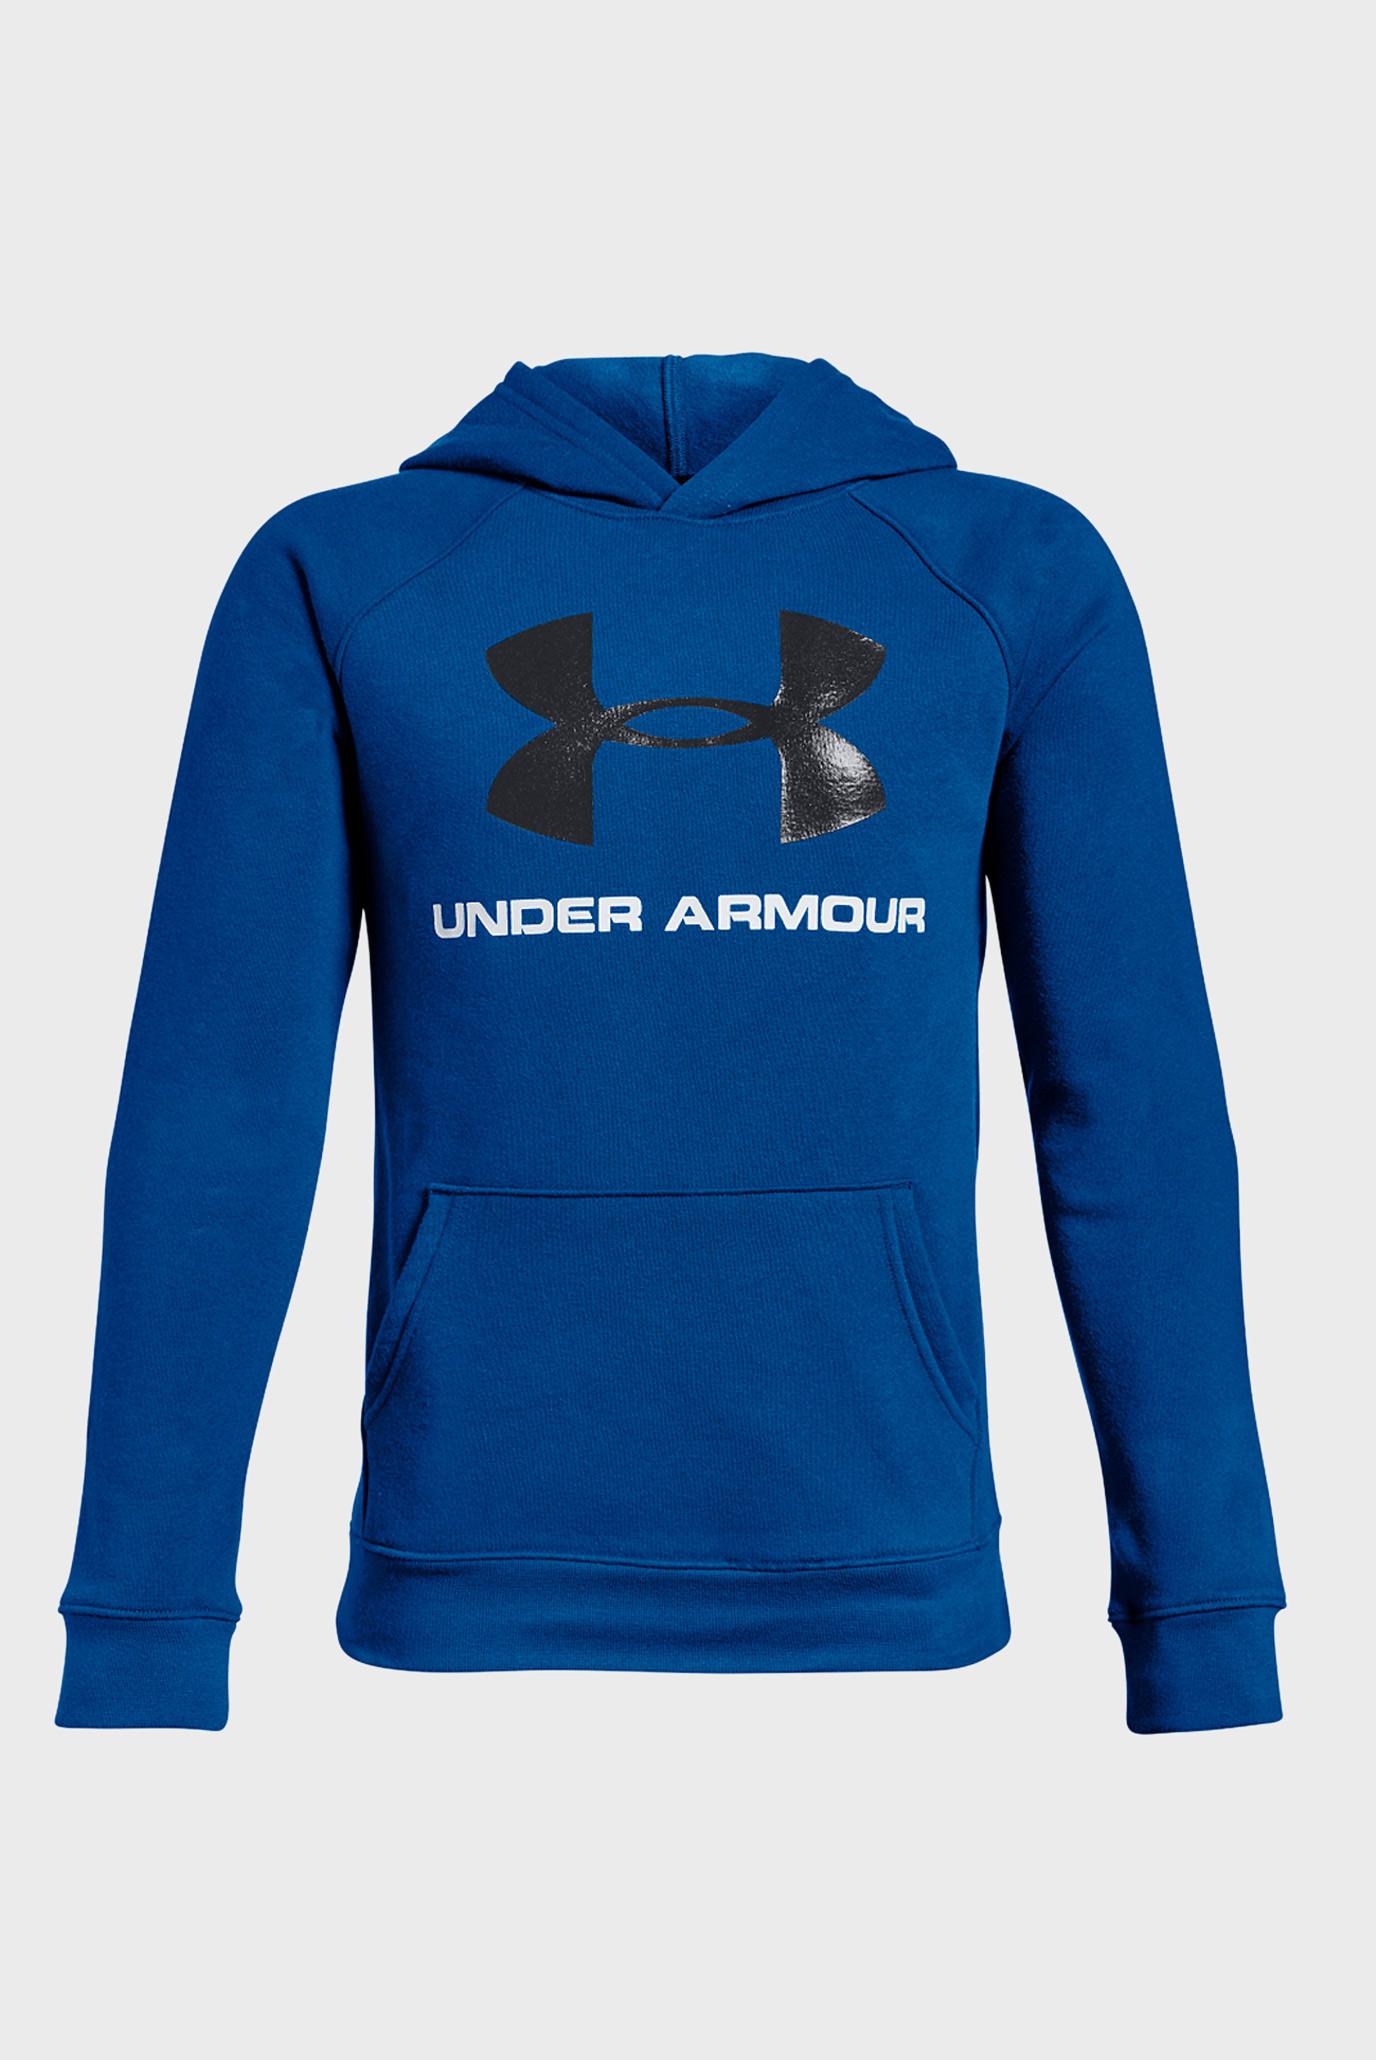 Дитяче синє худі Rival UA Logo Hoody 1